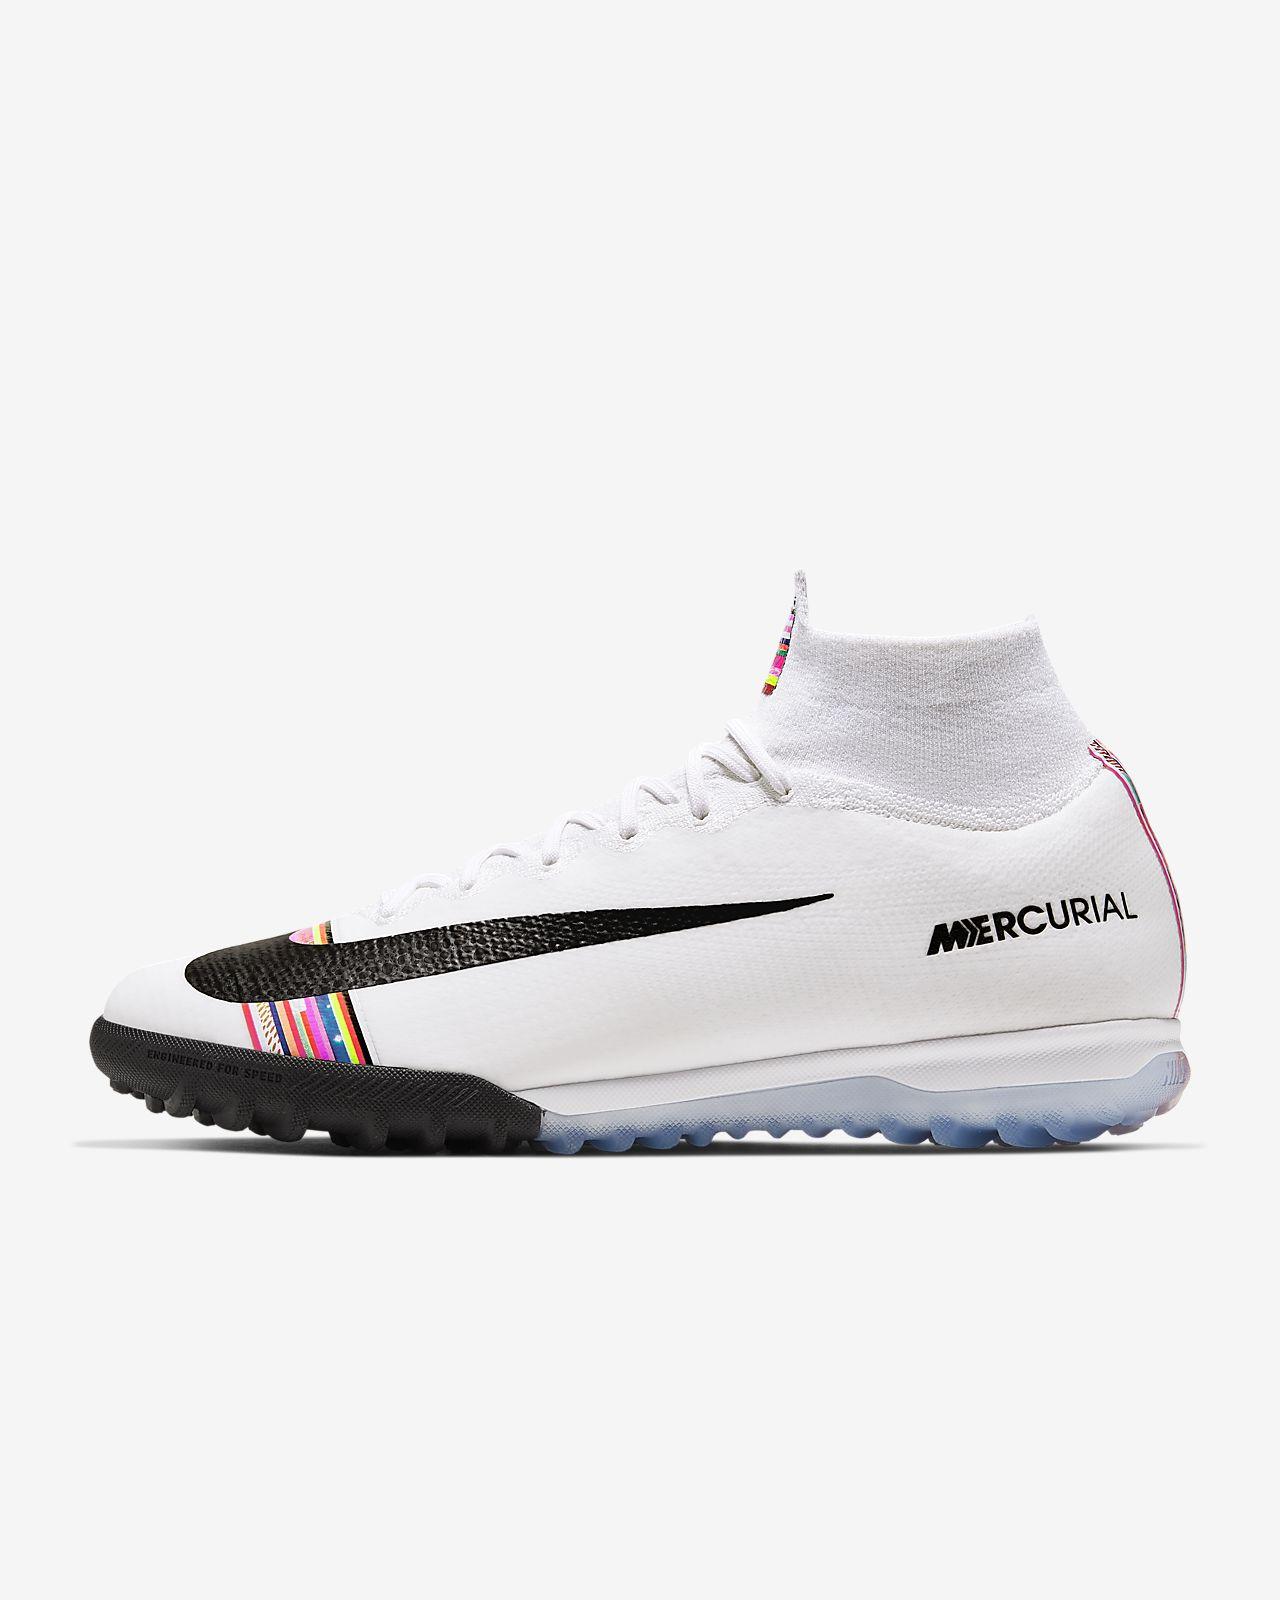 Nike SuperflyX 6 Elite LVL UP TF Turf Football Shoe